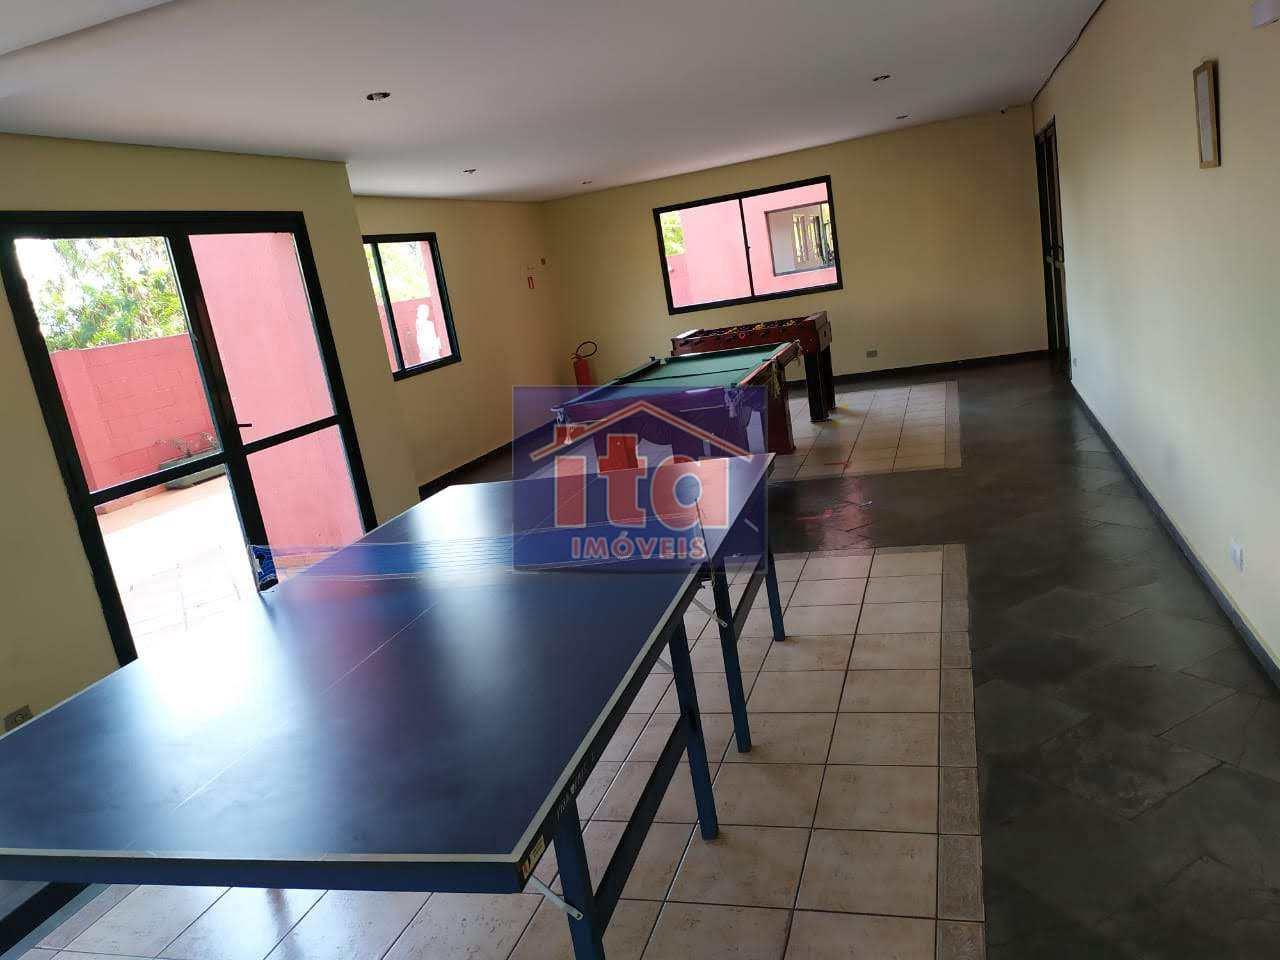 Apartamento com 2 dorms, Vila Erna, São Paulo - R$ 290 mil, Cod: 276774